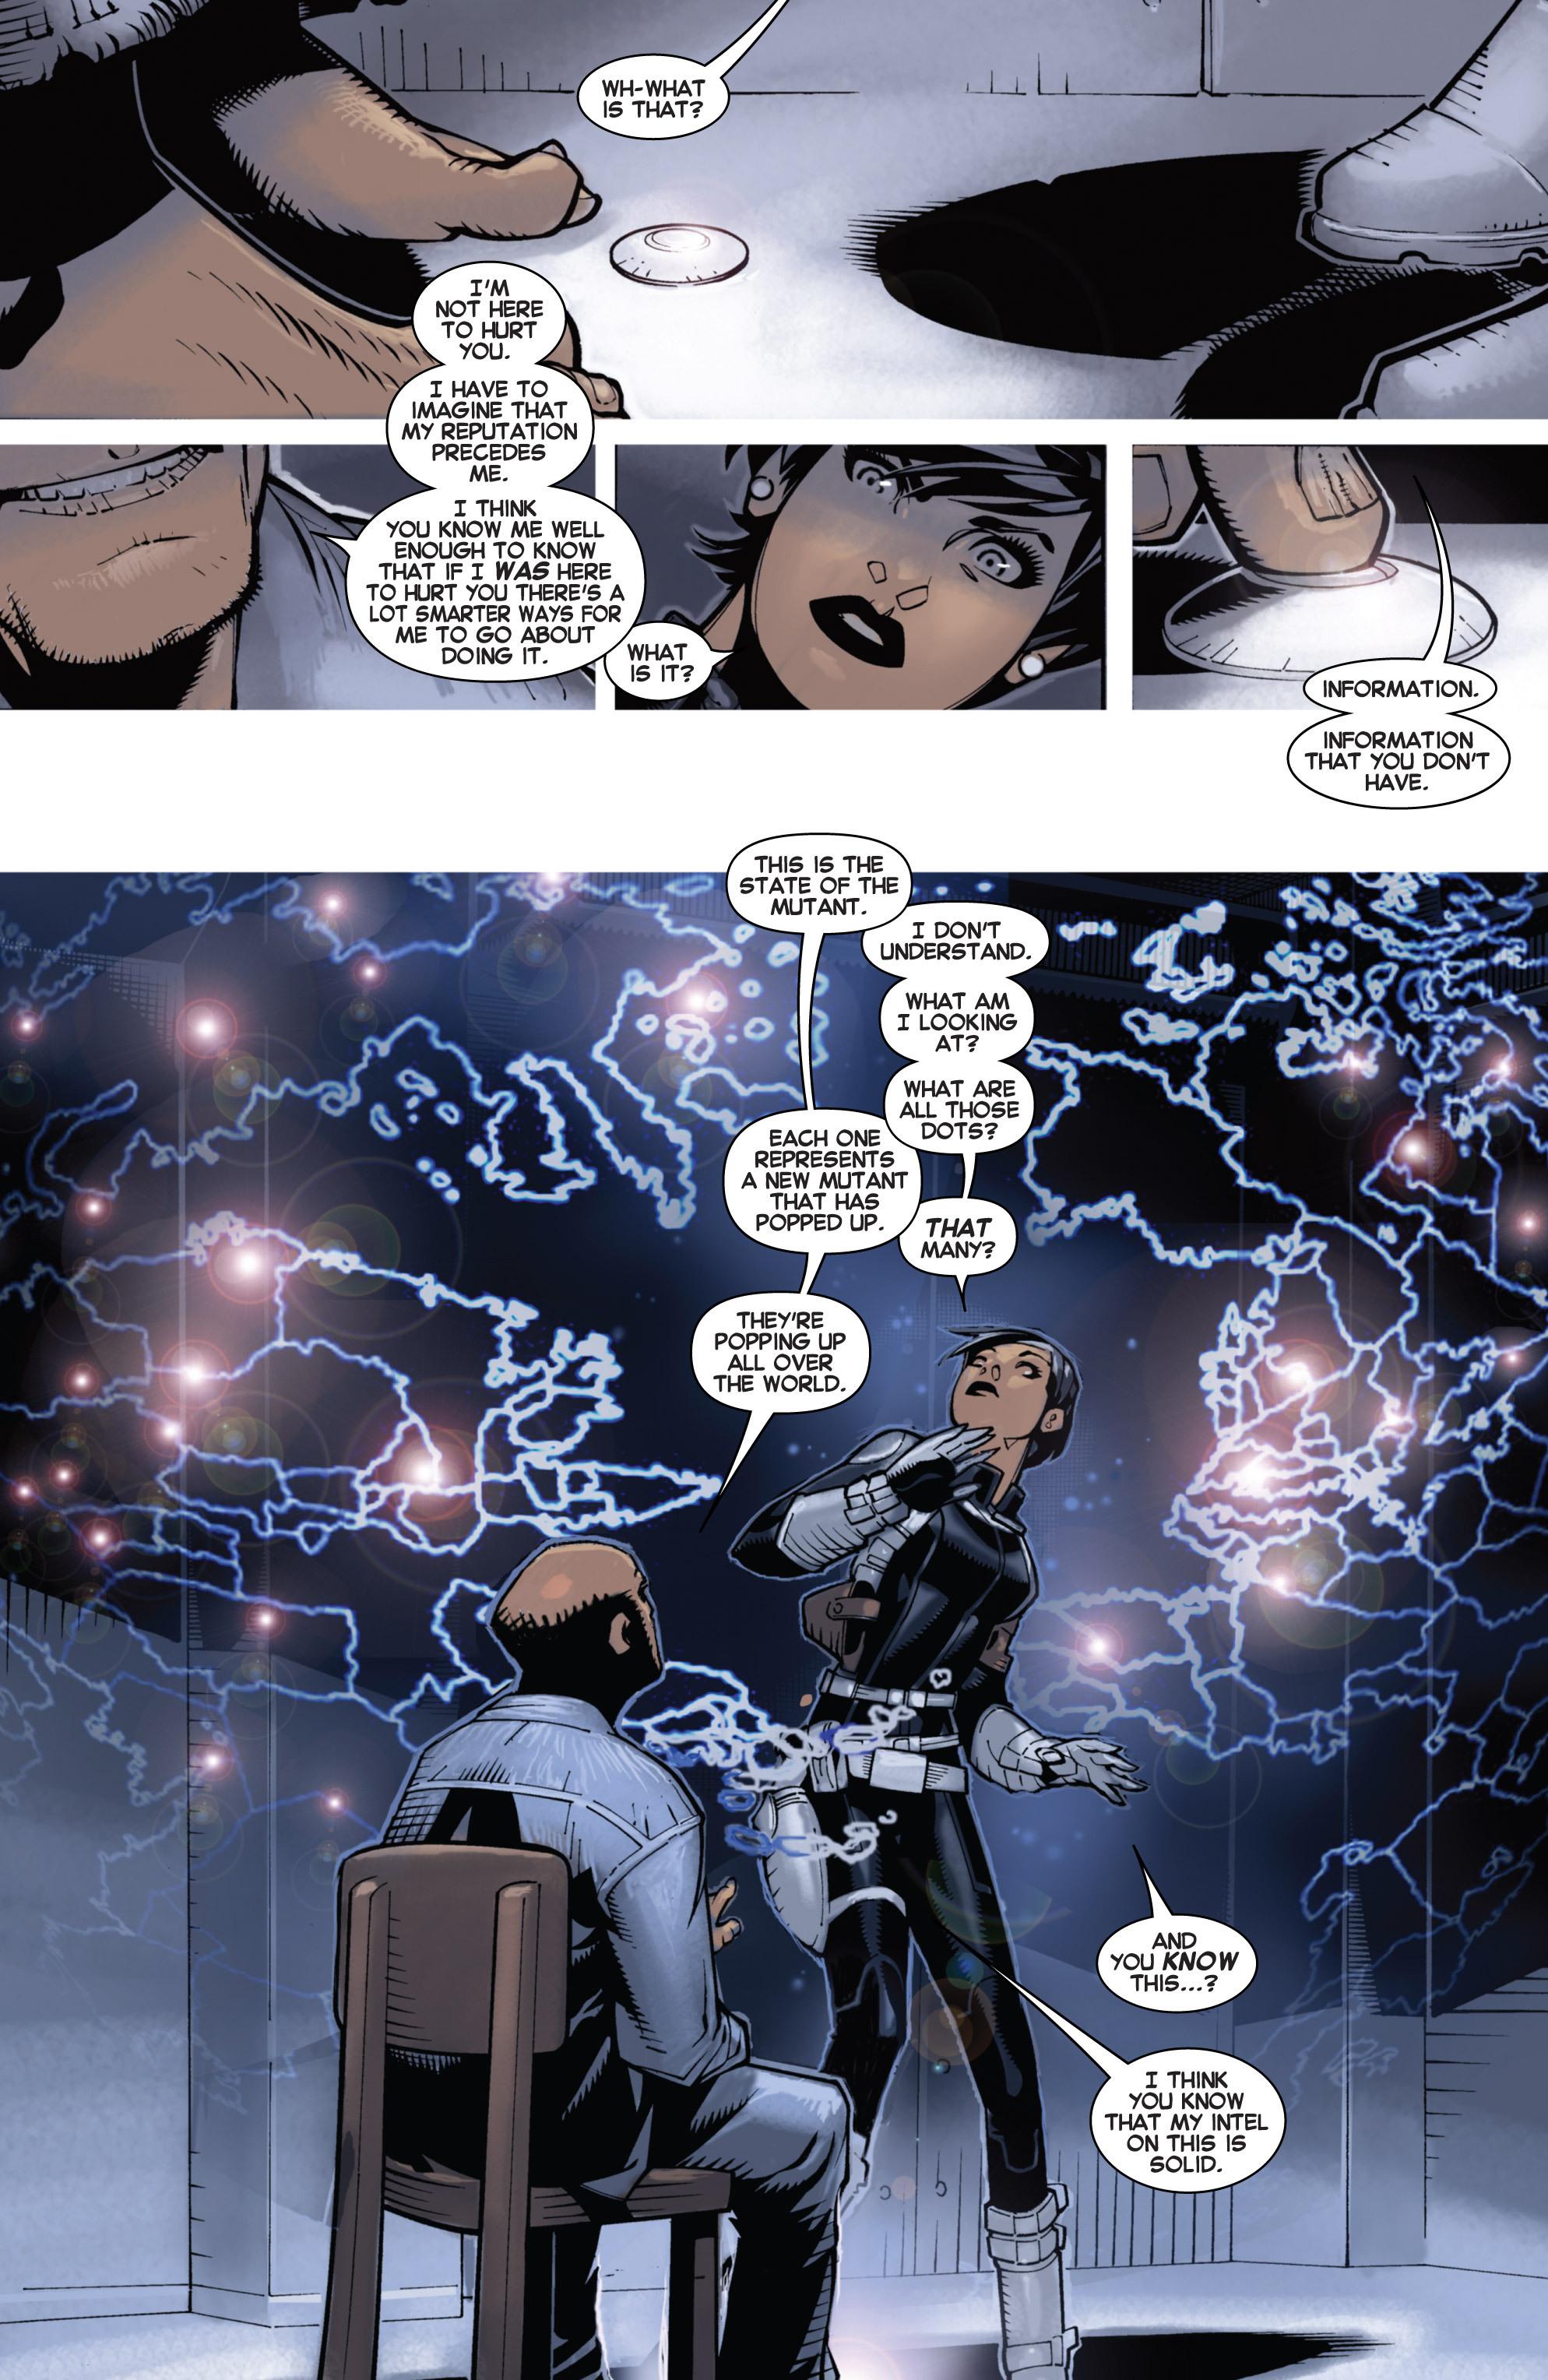 Read online Uncanny X-Men (2013) comic -  Issue # _TPB 1 - Revolution - 8